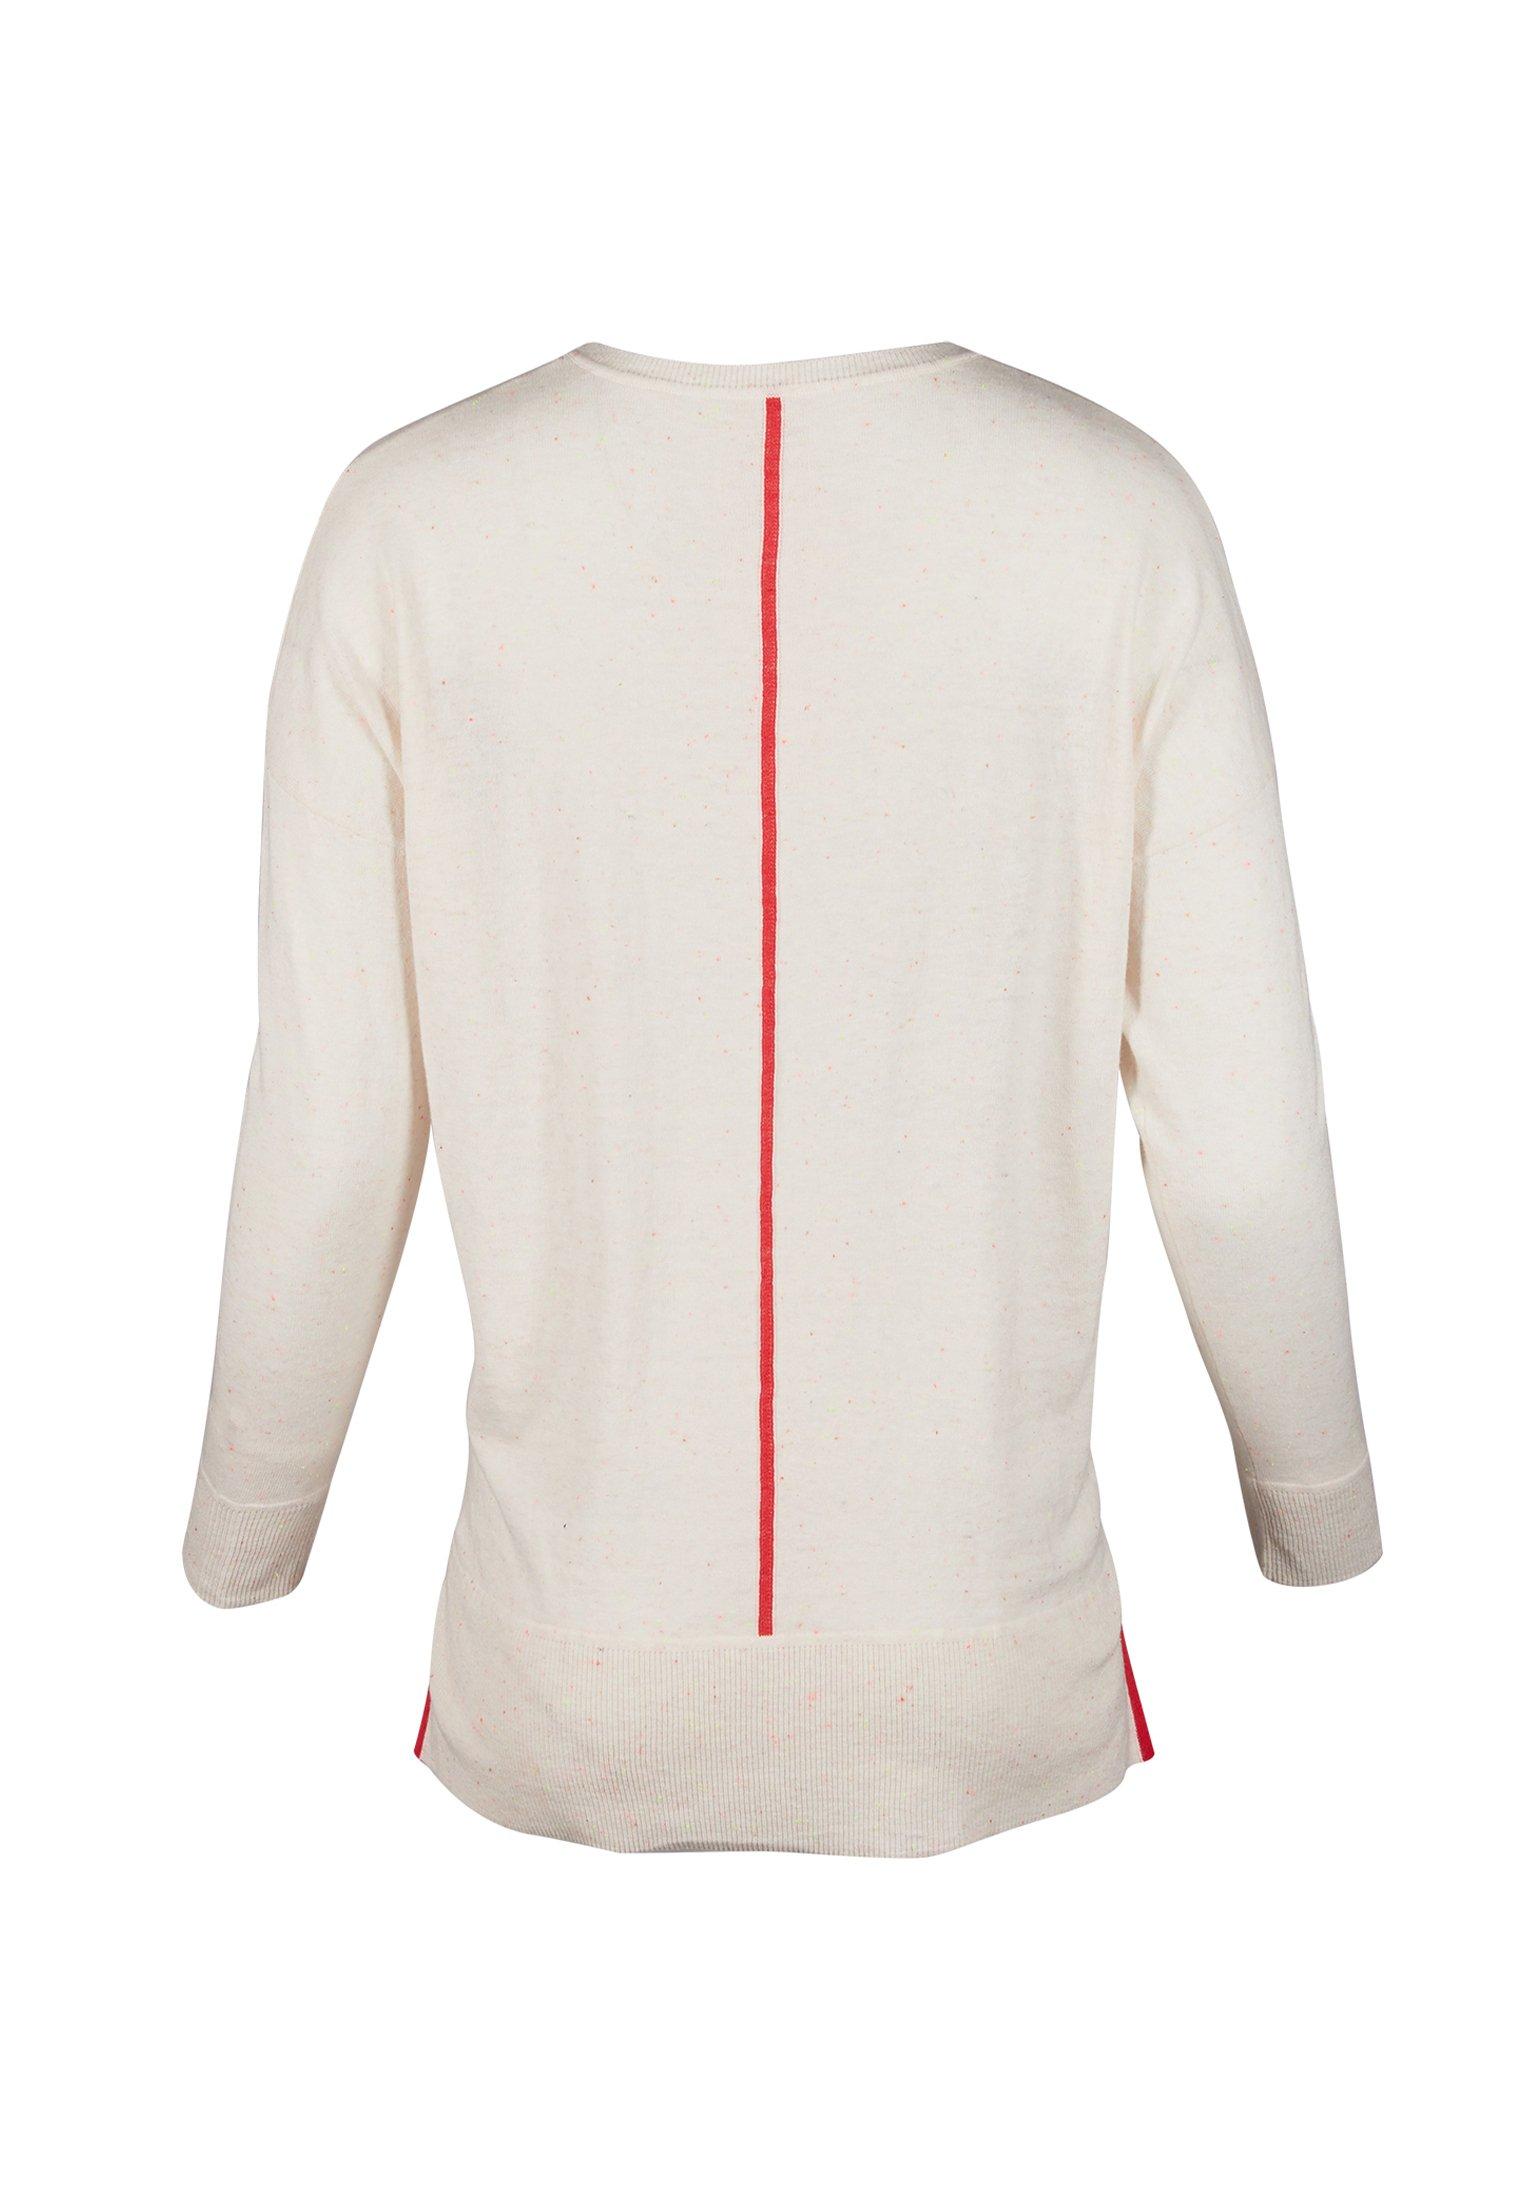 Oliver Bonas NEPPED CONTRAST TRIM  - Pullover - white